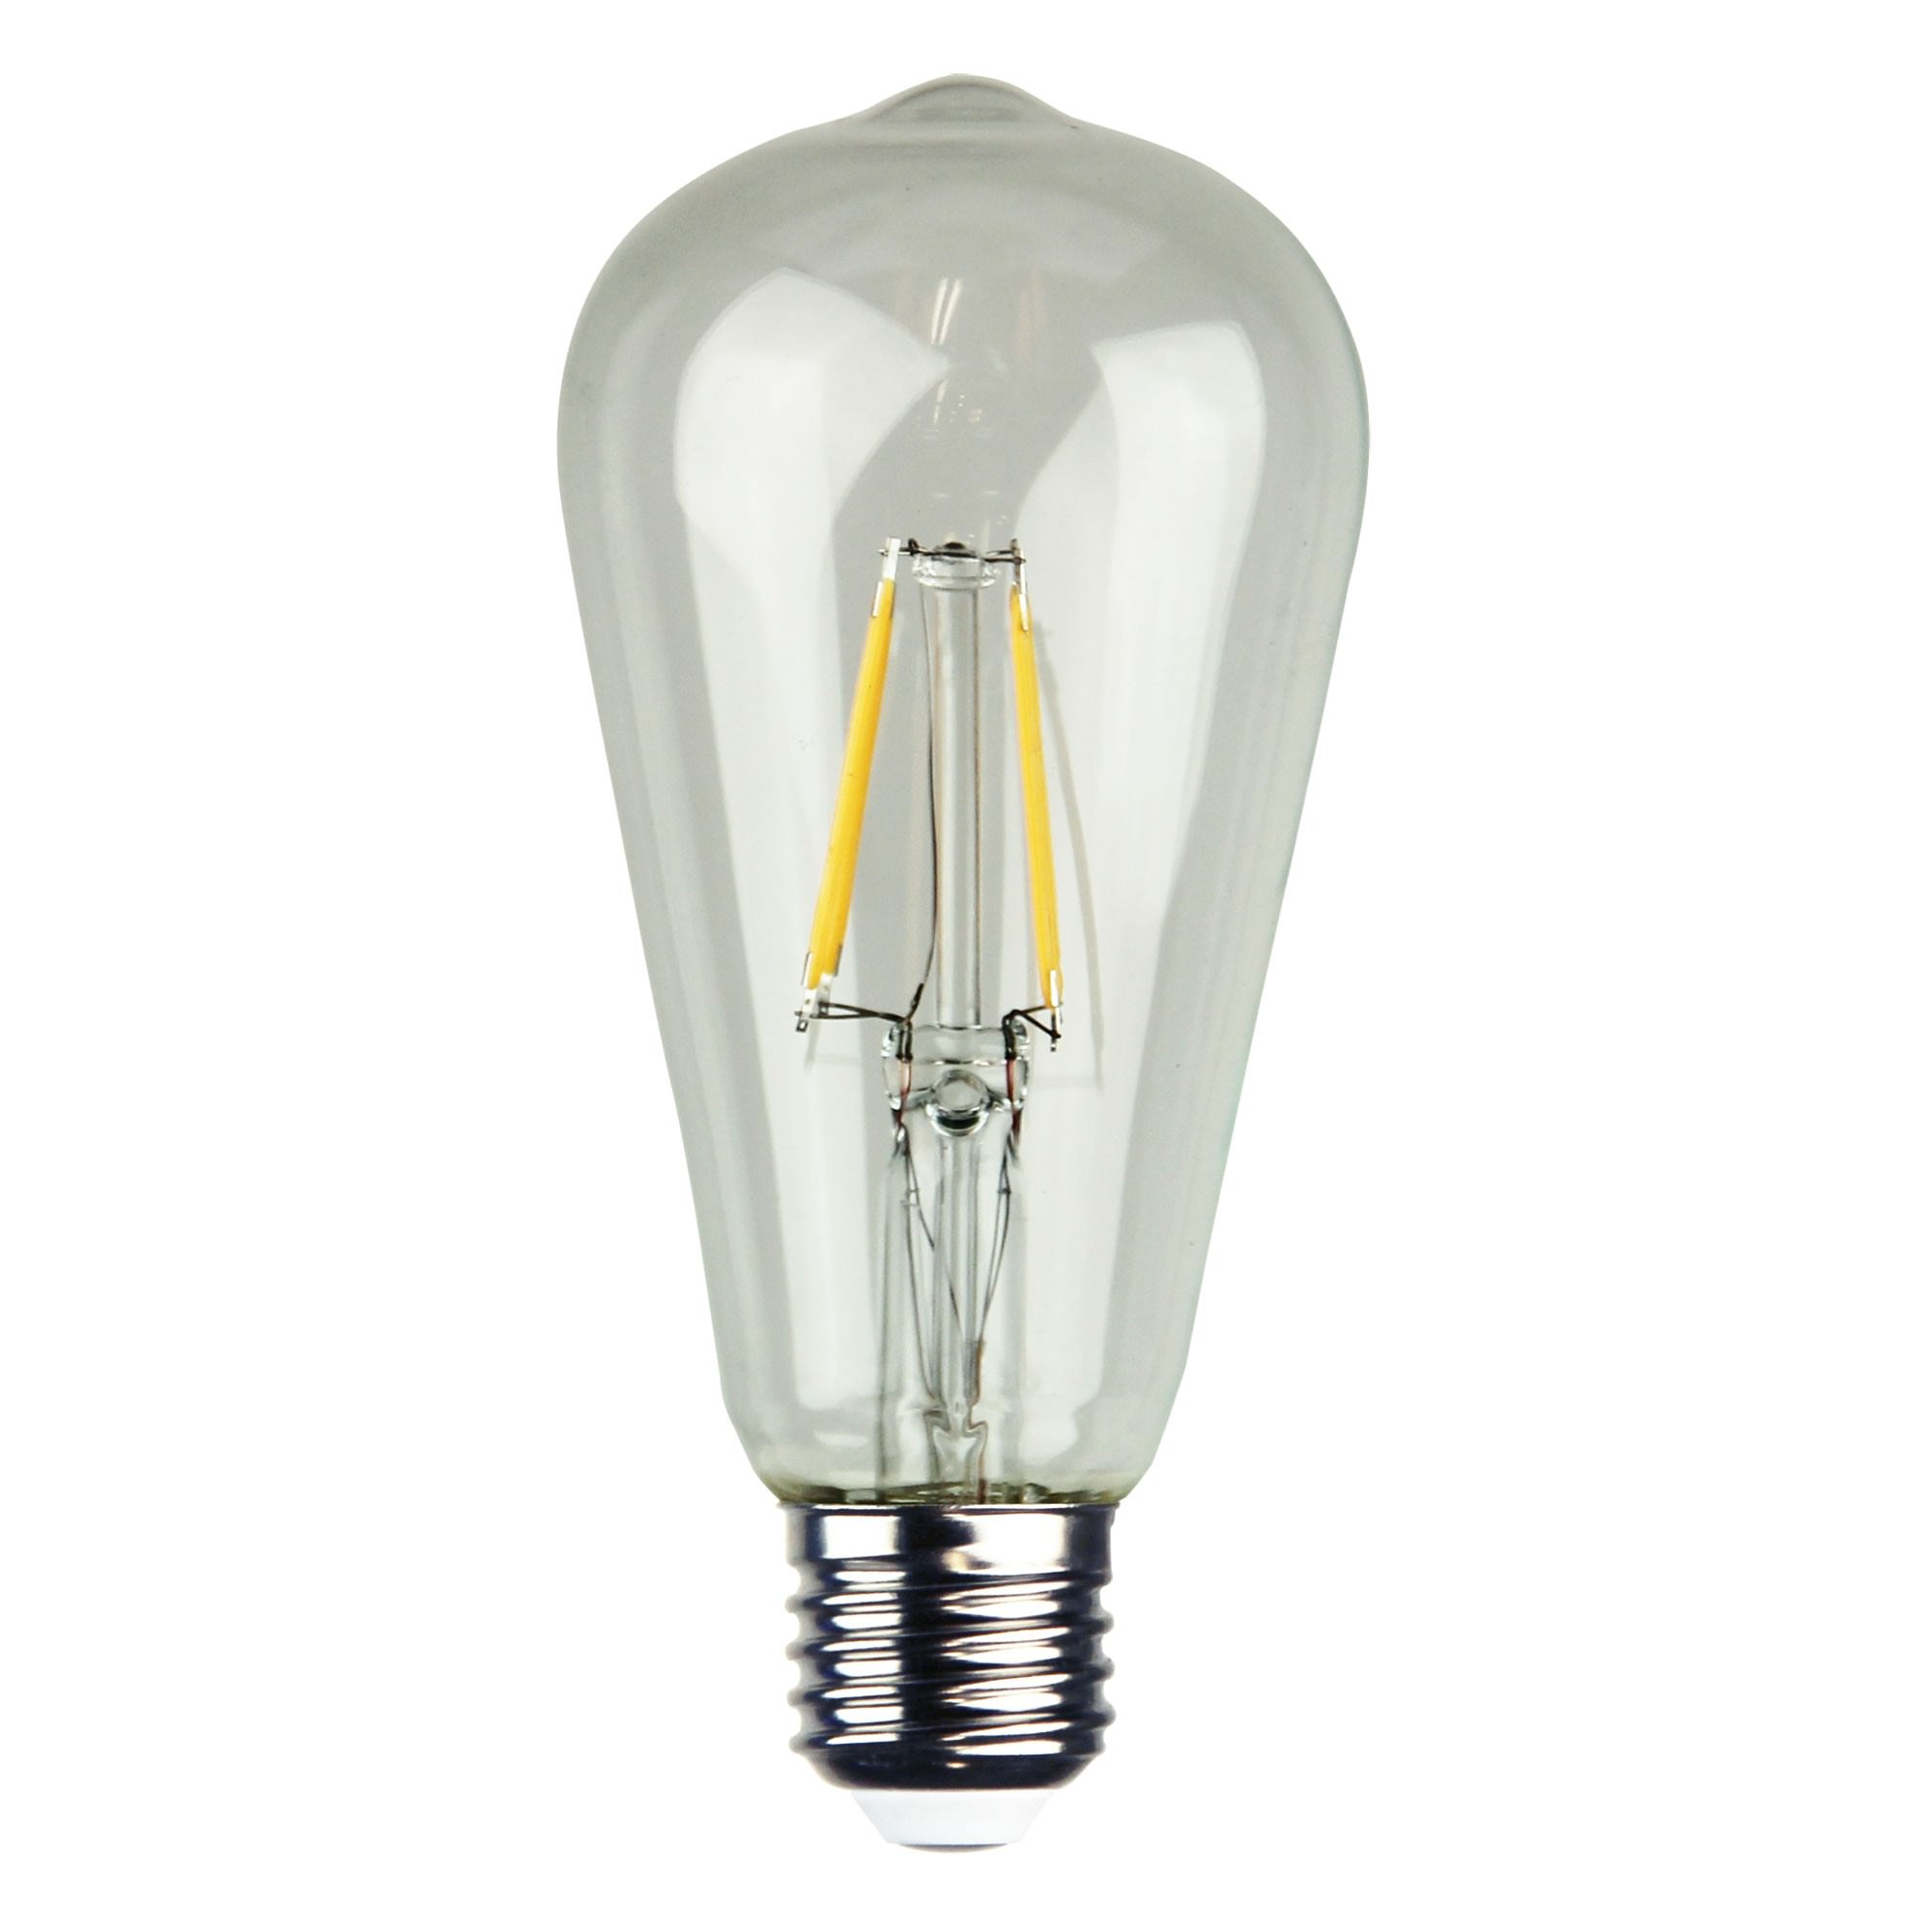 Allume Dimmable LED Filament Globe, E27, 2700K, ST64 Shape